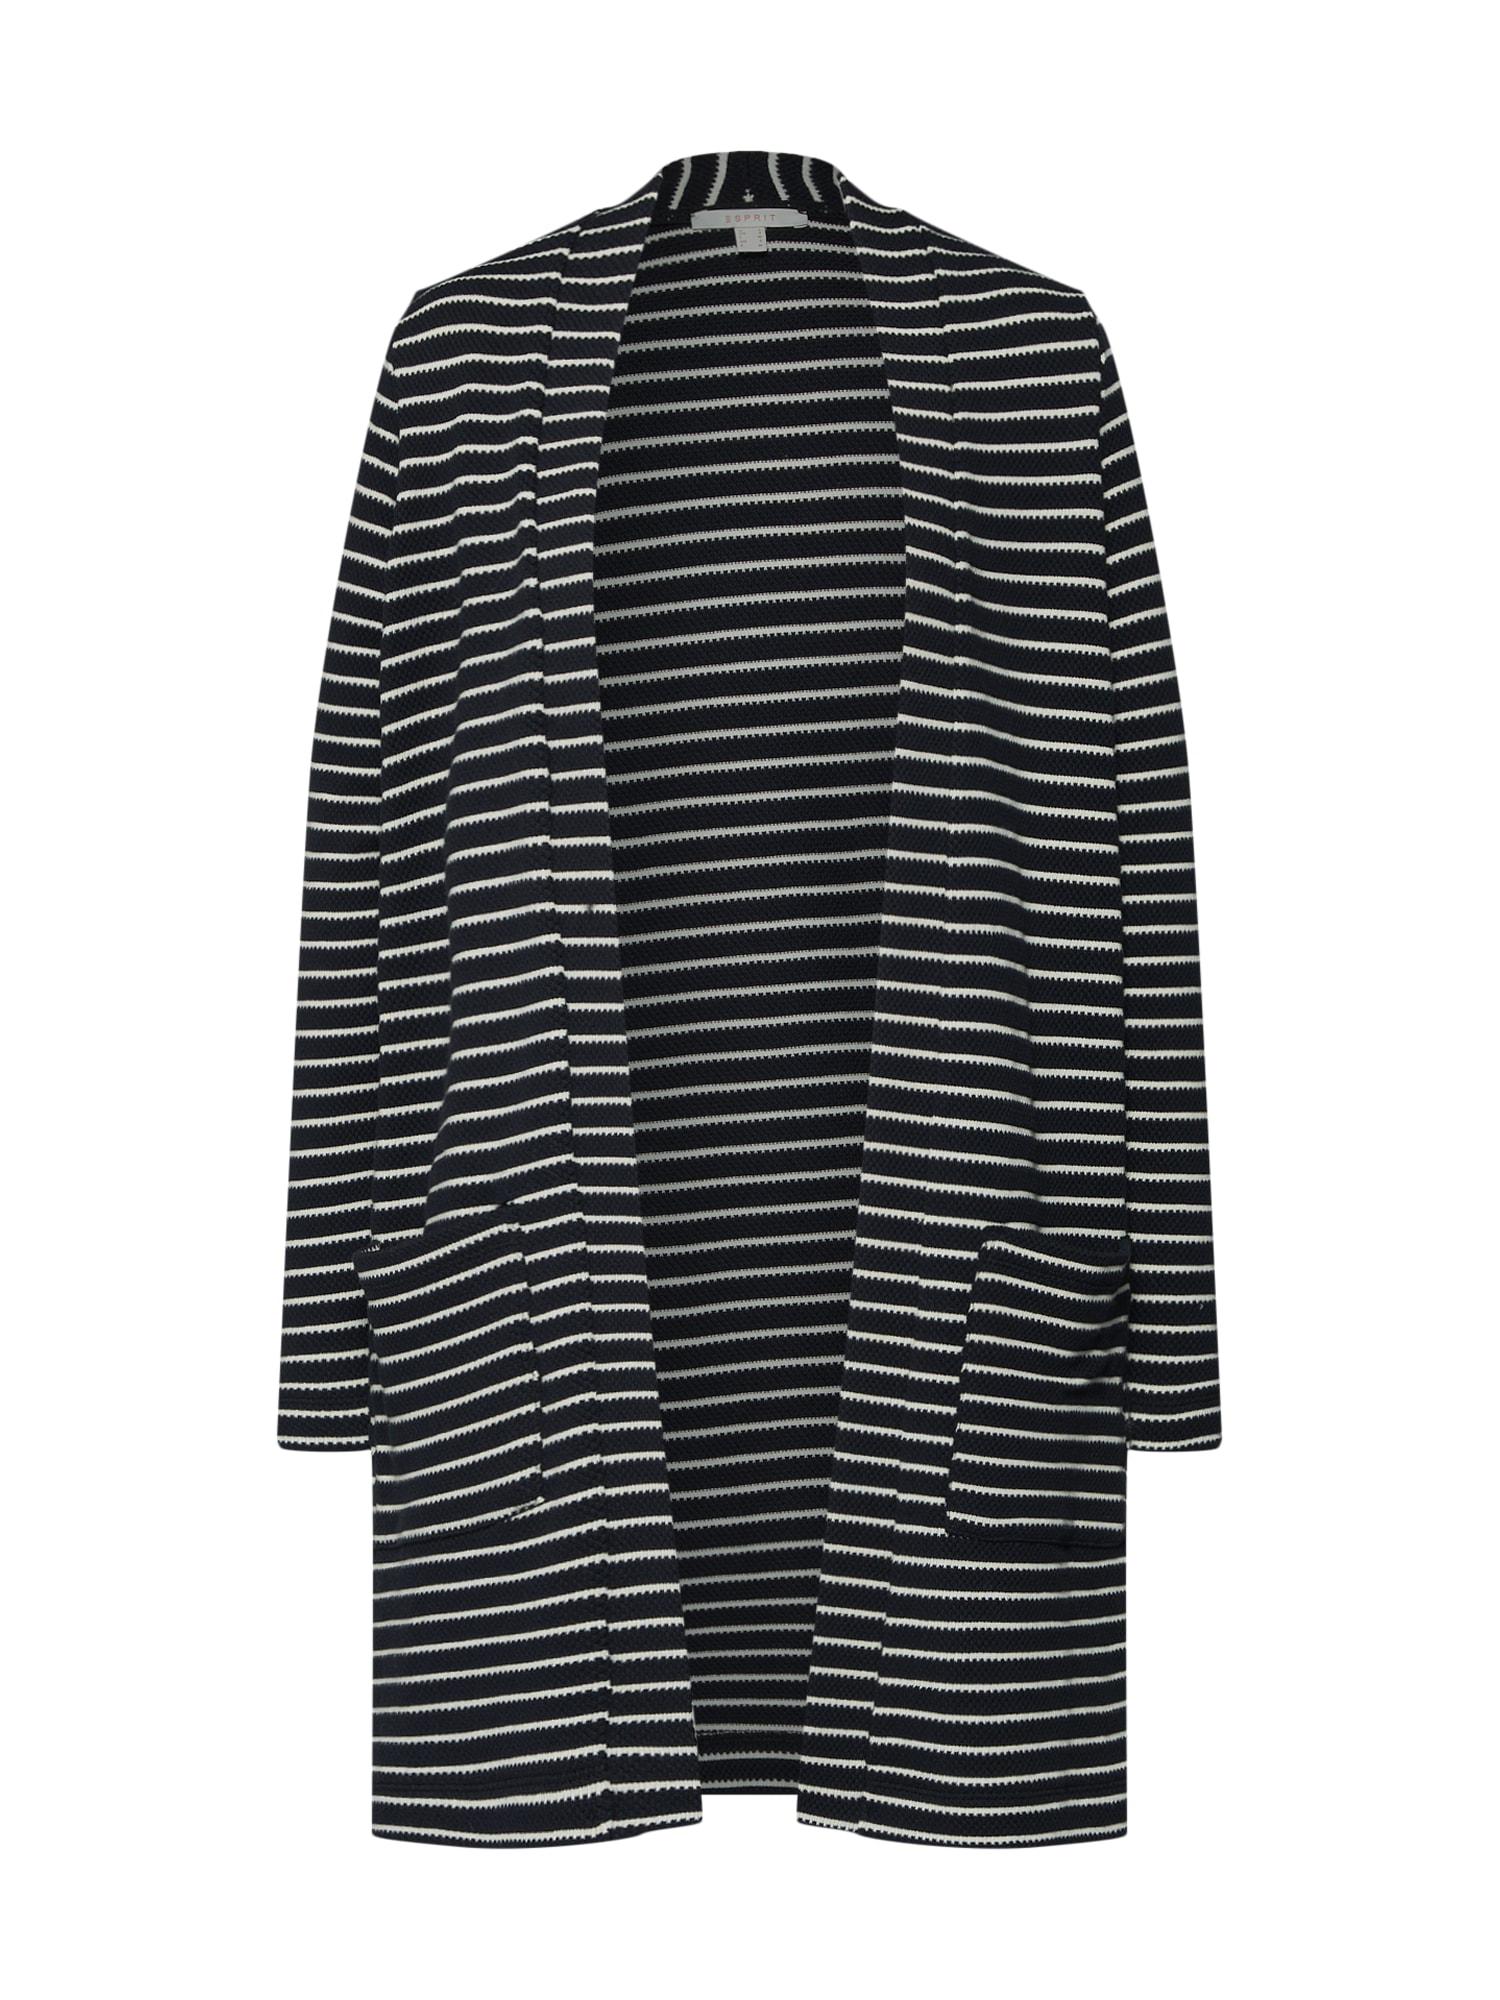 Pletený kabátek černá bílá ESPRIT